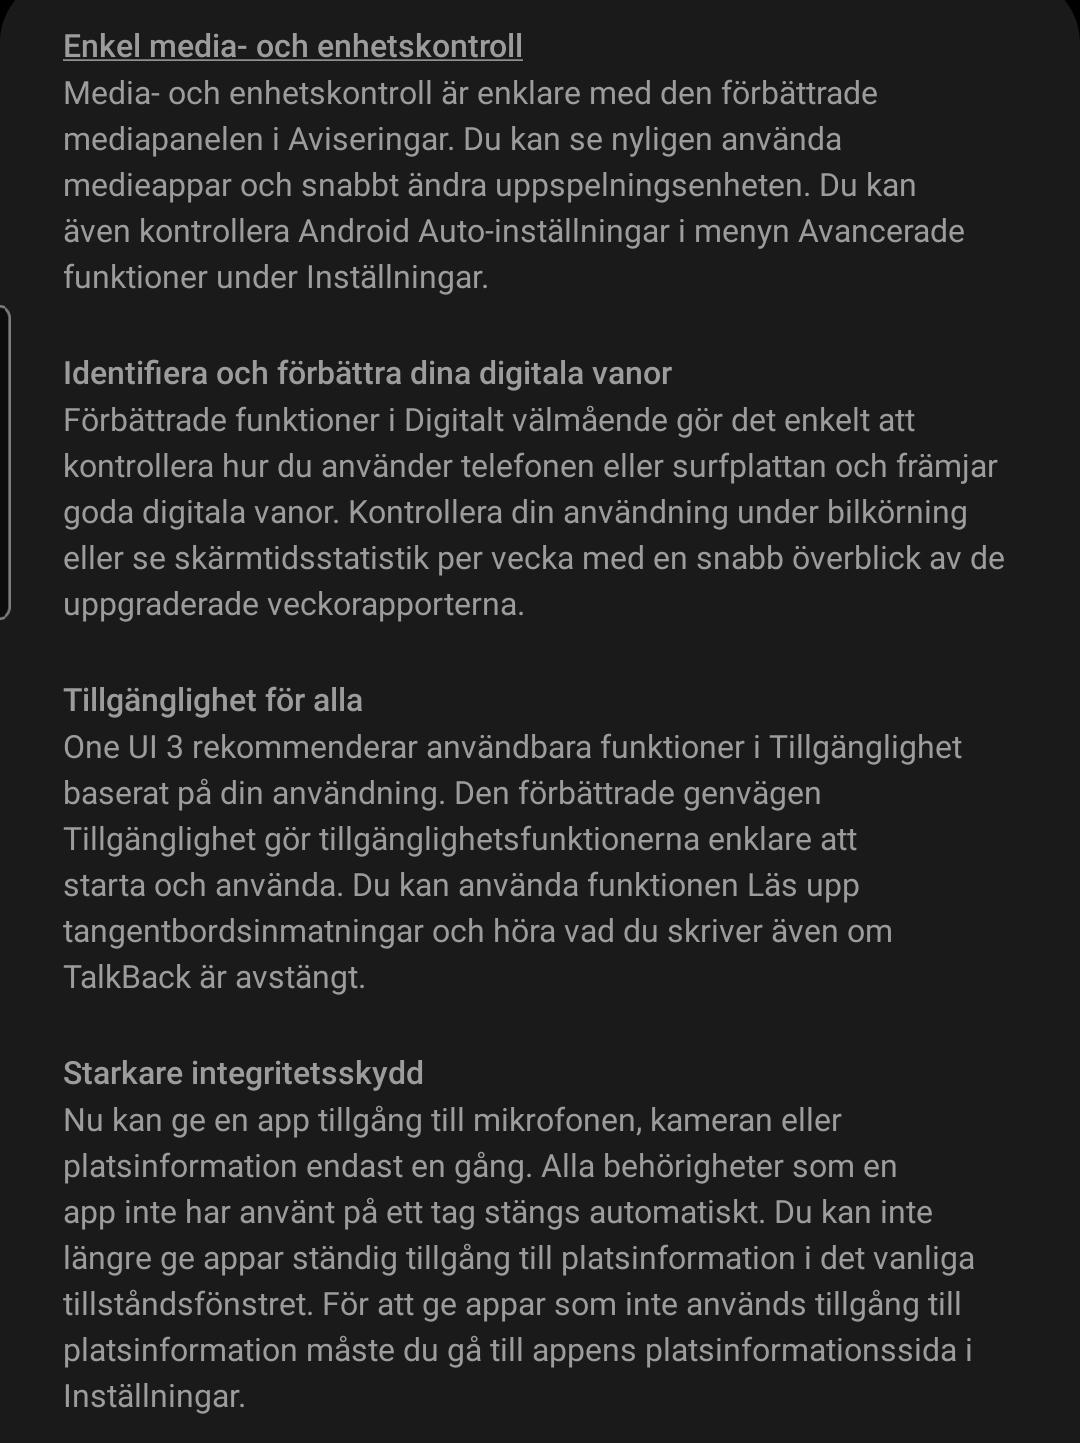 SmartSelect_20201203-131715_Software update.jpg